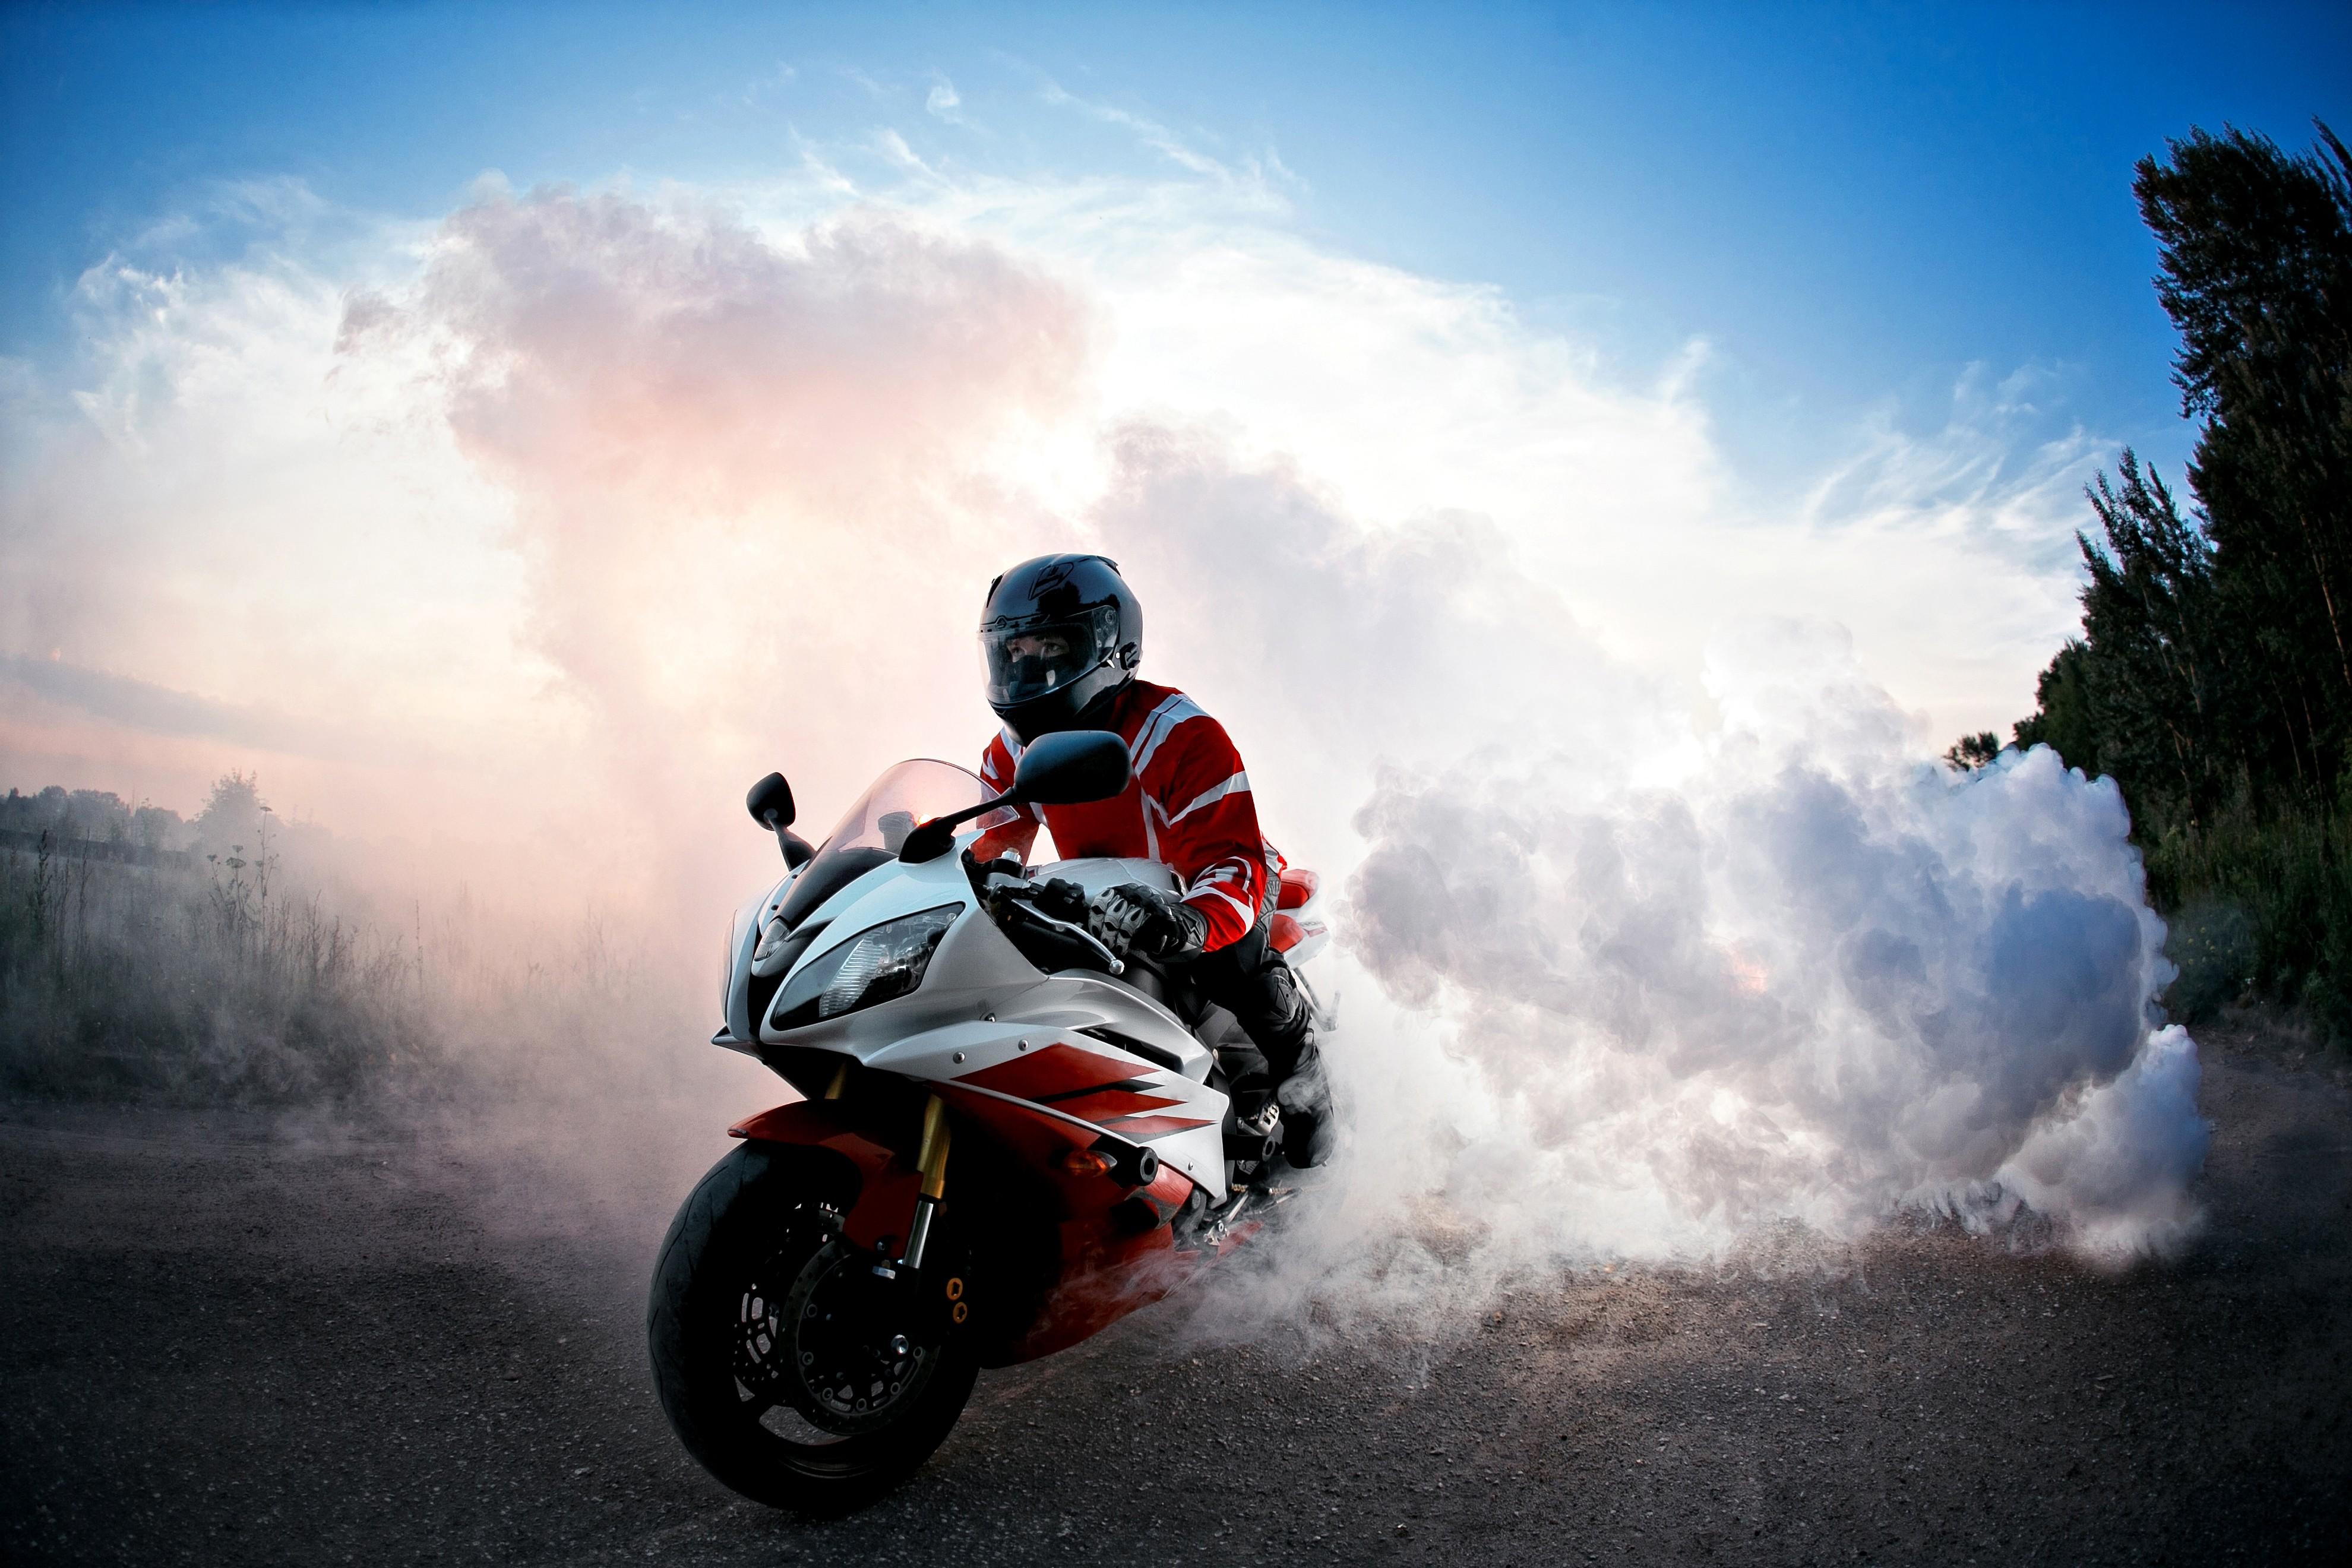 motorbike wallpapers 15 - [3960 x 2640]